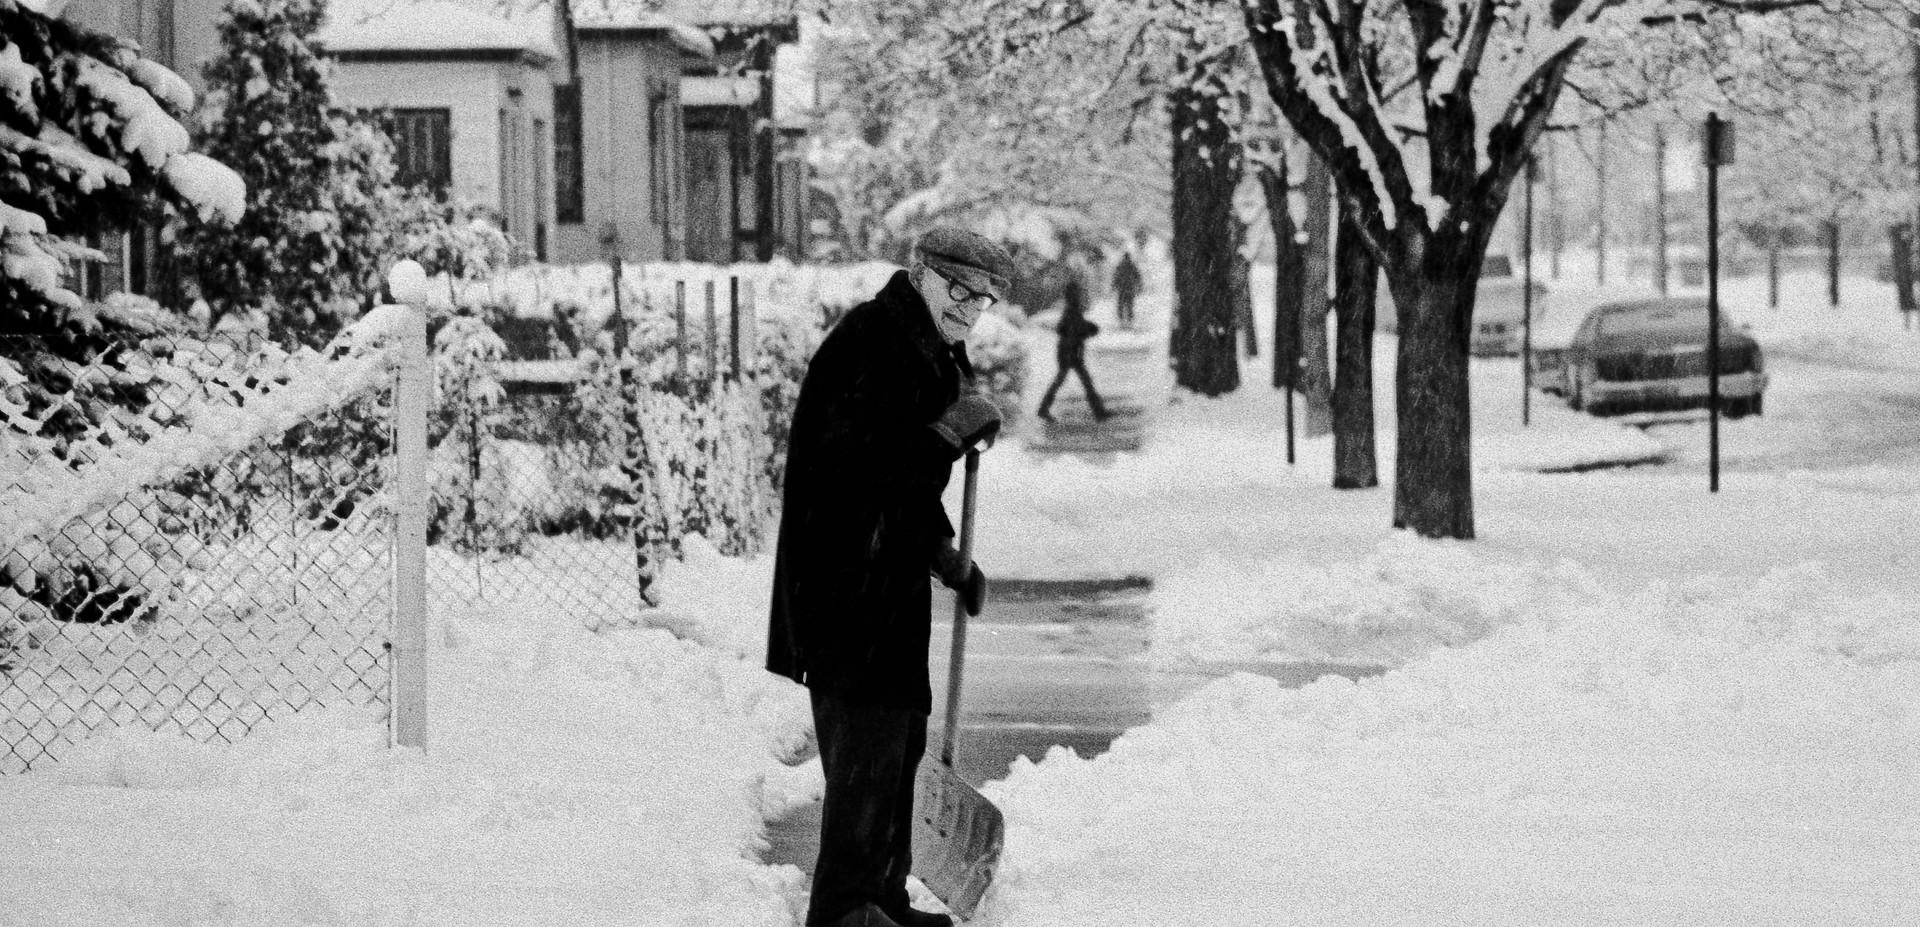 St Catherines, Canada 1982